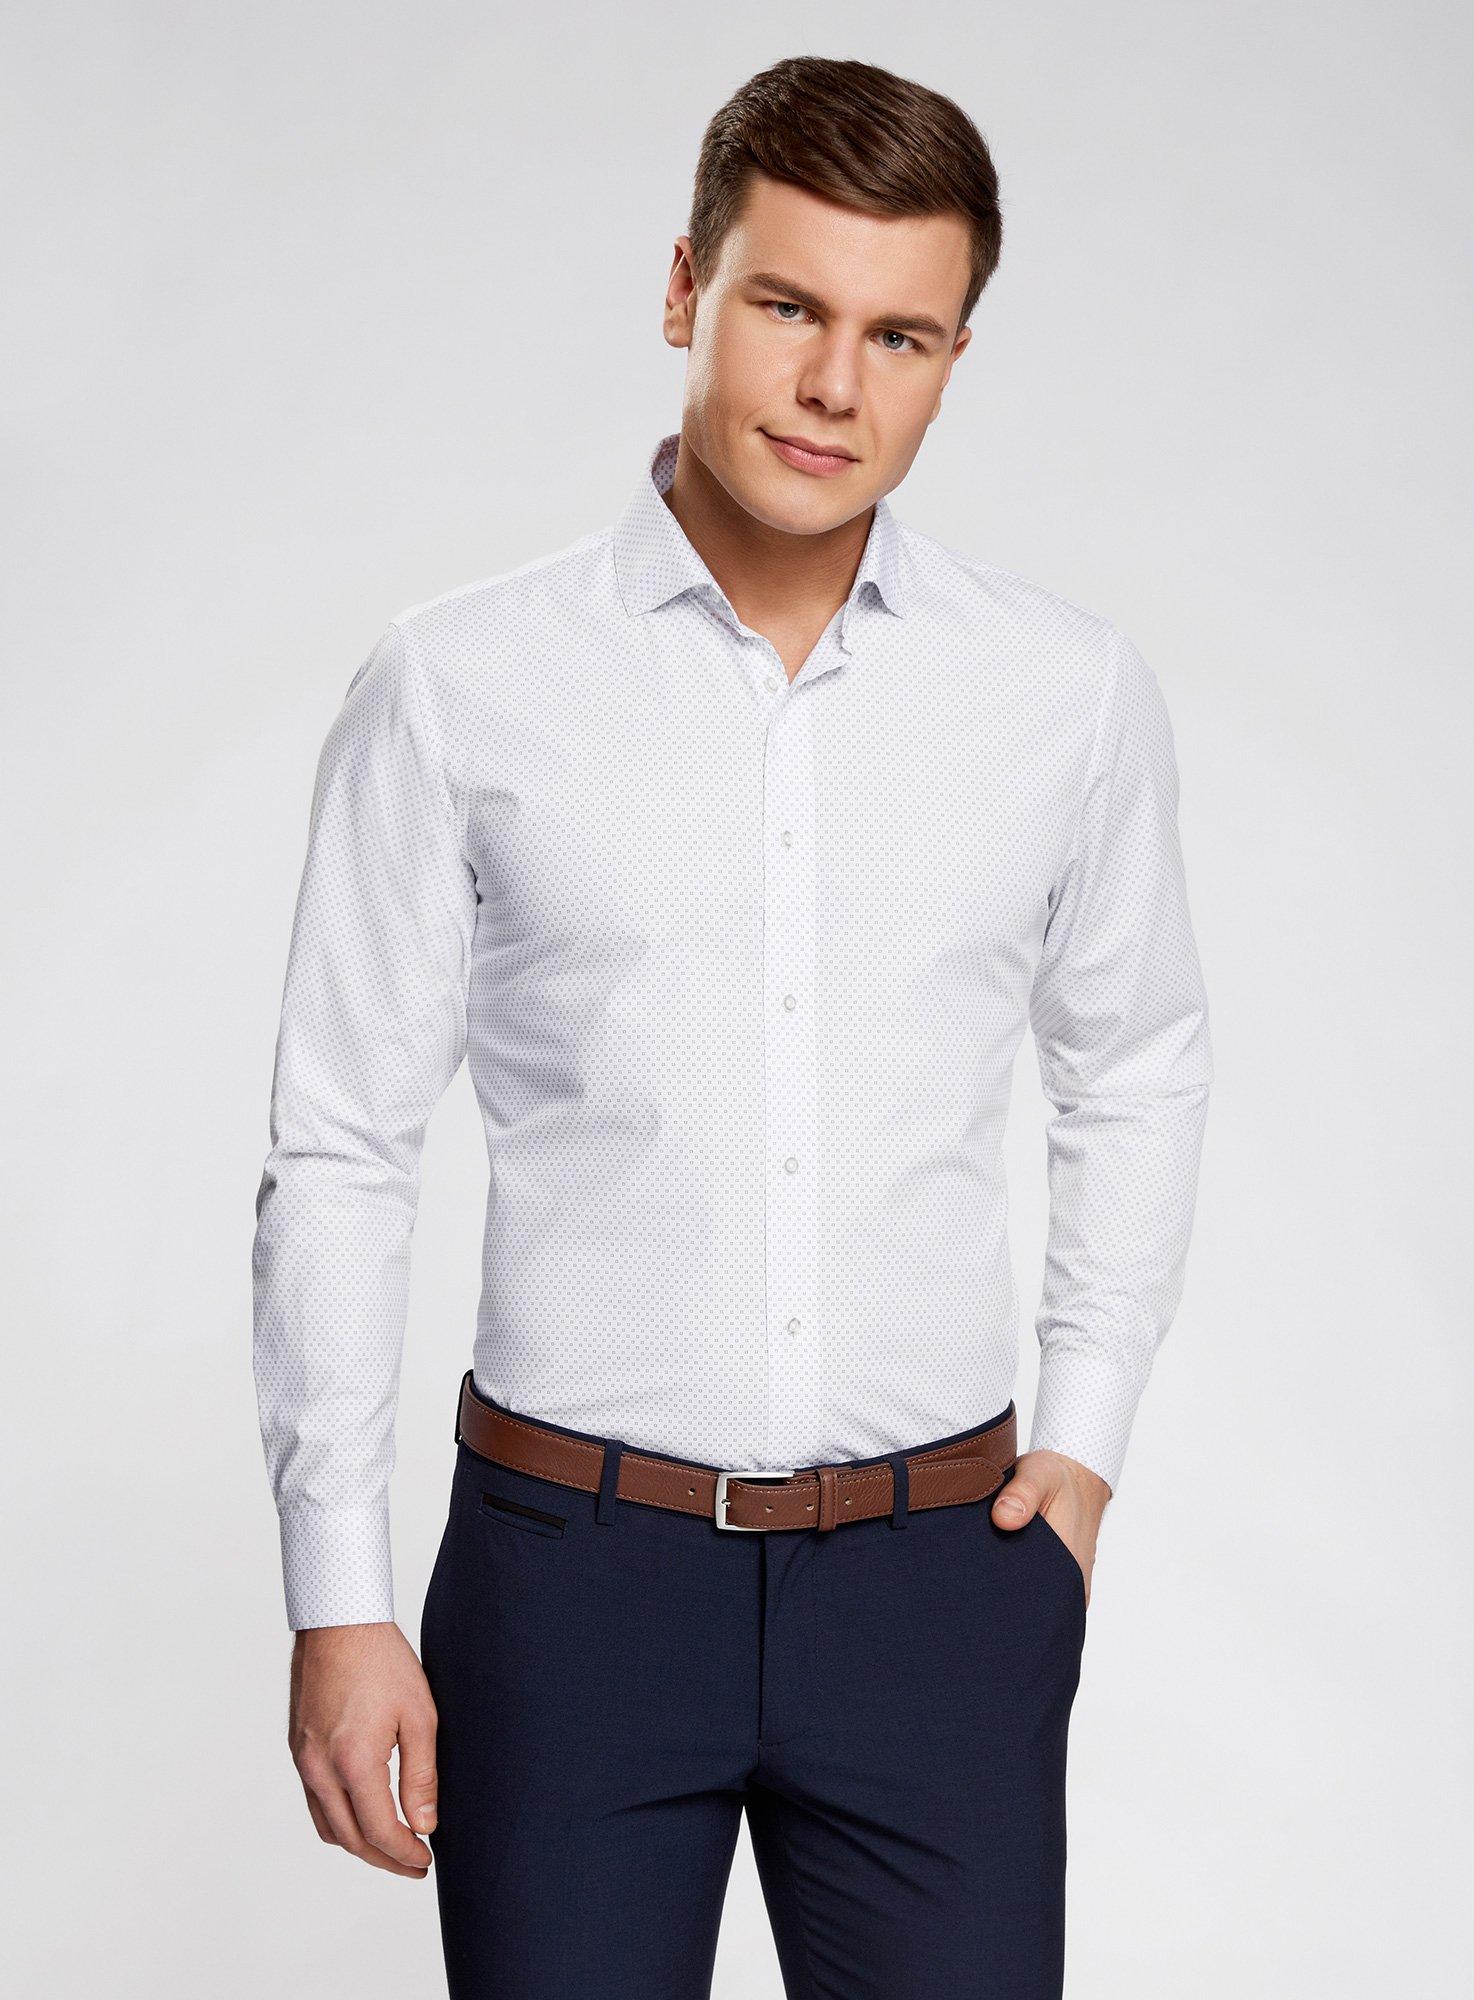 5cb5a84bc8d Купить Мужская белая рубашка Oodji Oodji 3L110175M 19370N 1075G – Киев